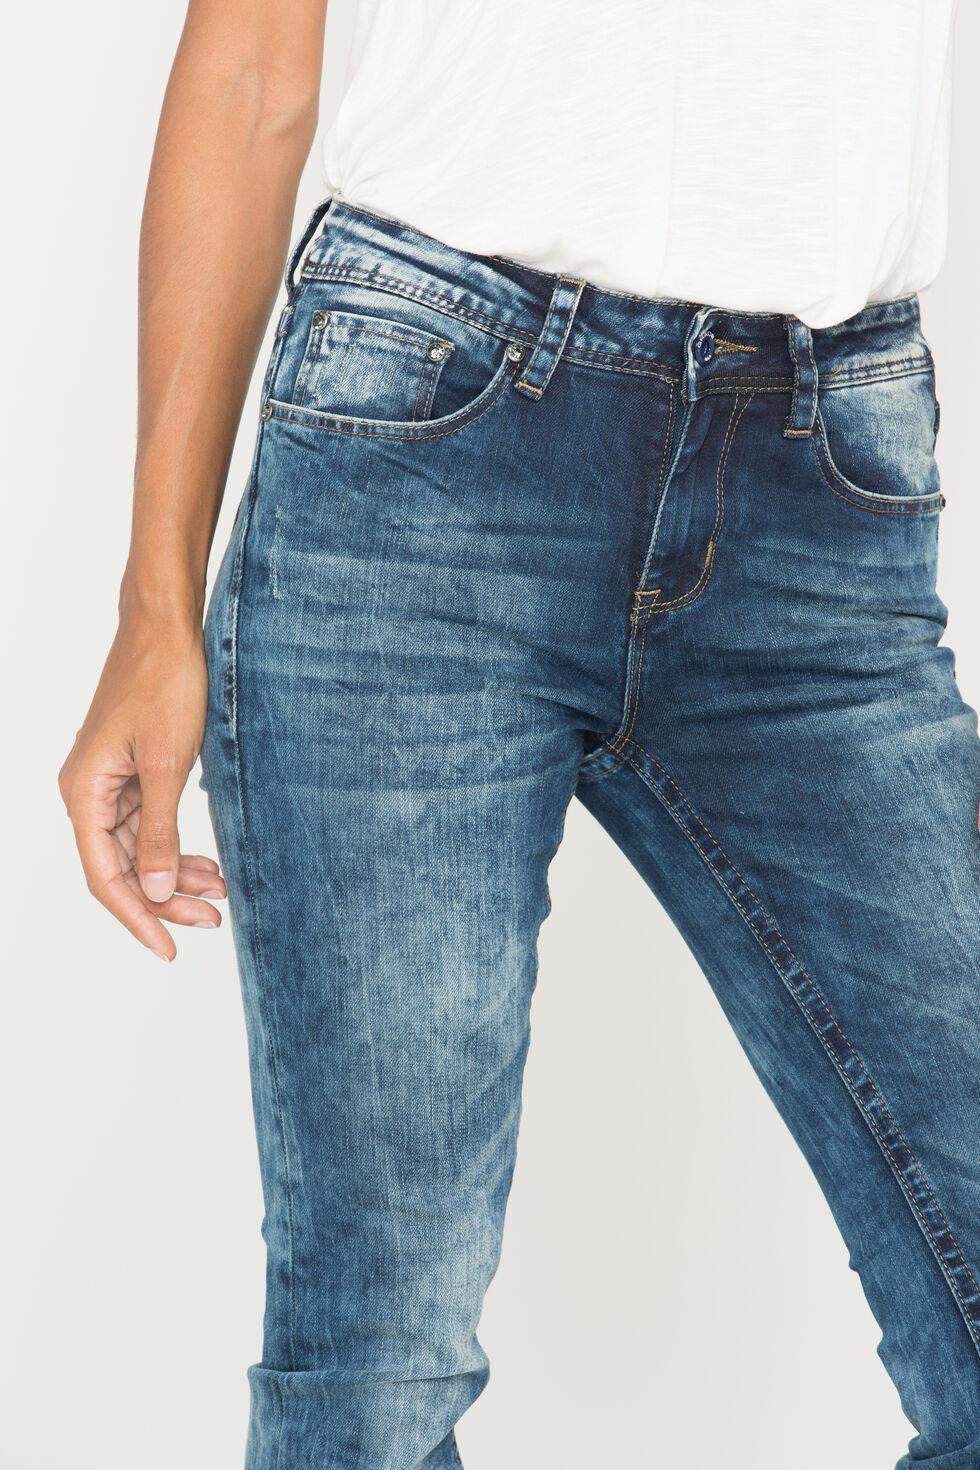 Grace in LA Women's Medium Wash Skinny Jeans, Indigo, hi-res